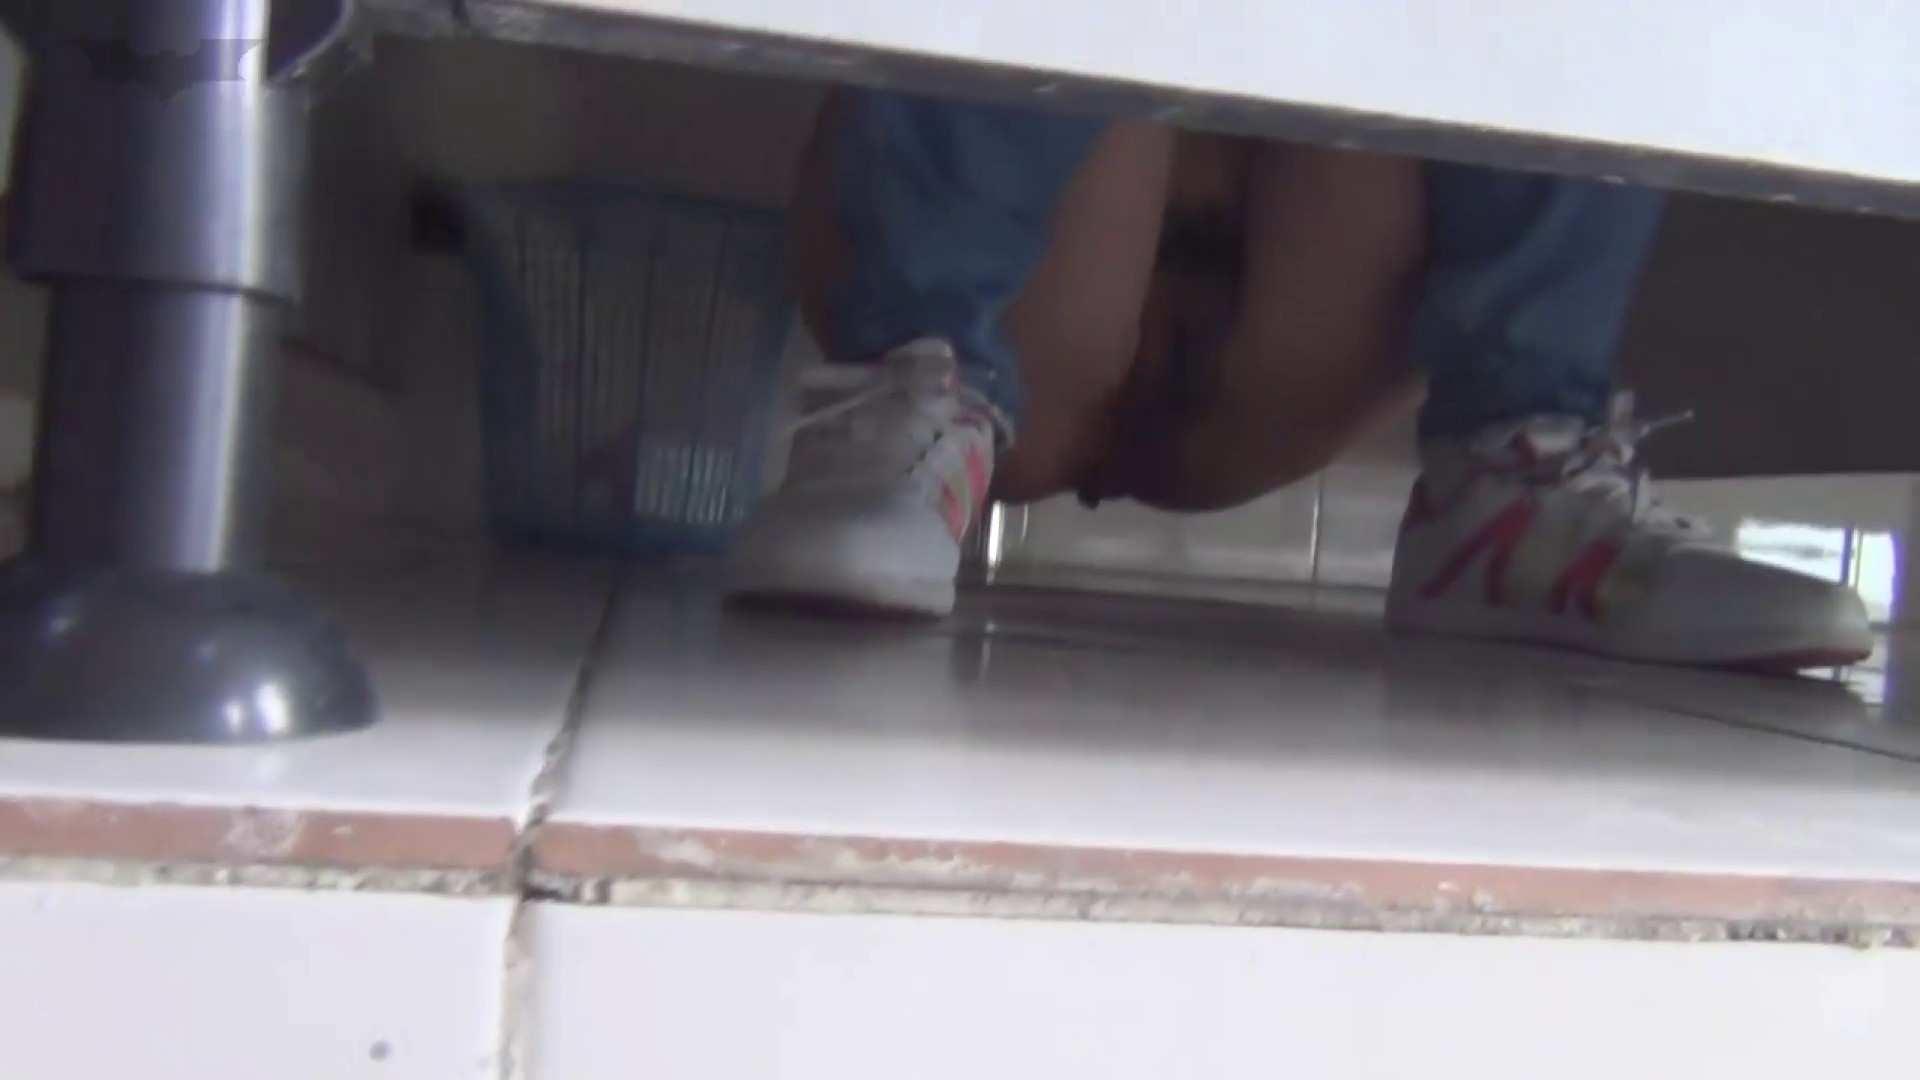 JD盗撮 美女の洗面所の秘密 Vol.34 トイレで・・・  98画像 72